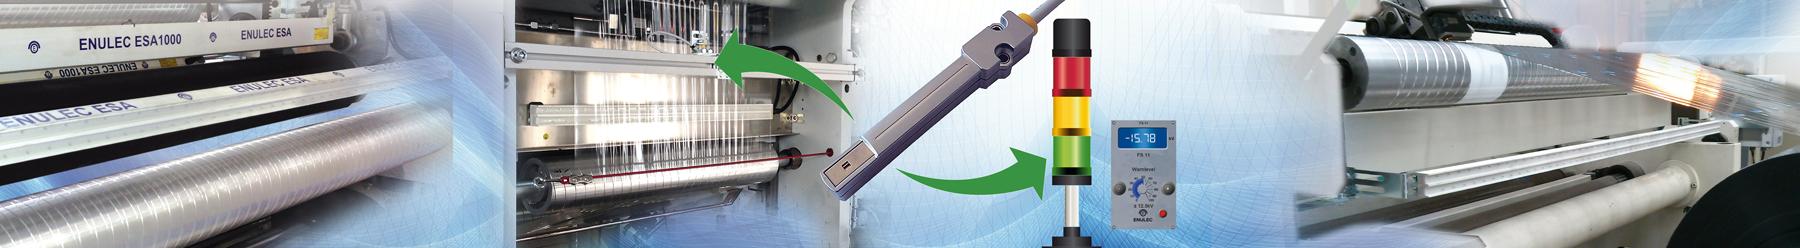 ENULEC balanced charging system